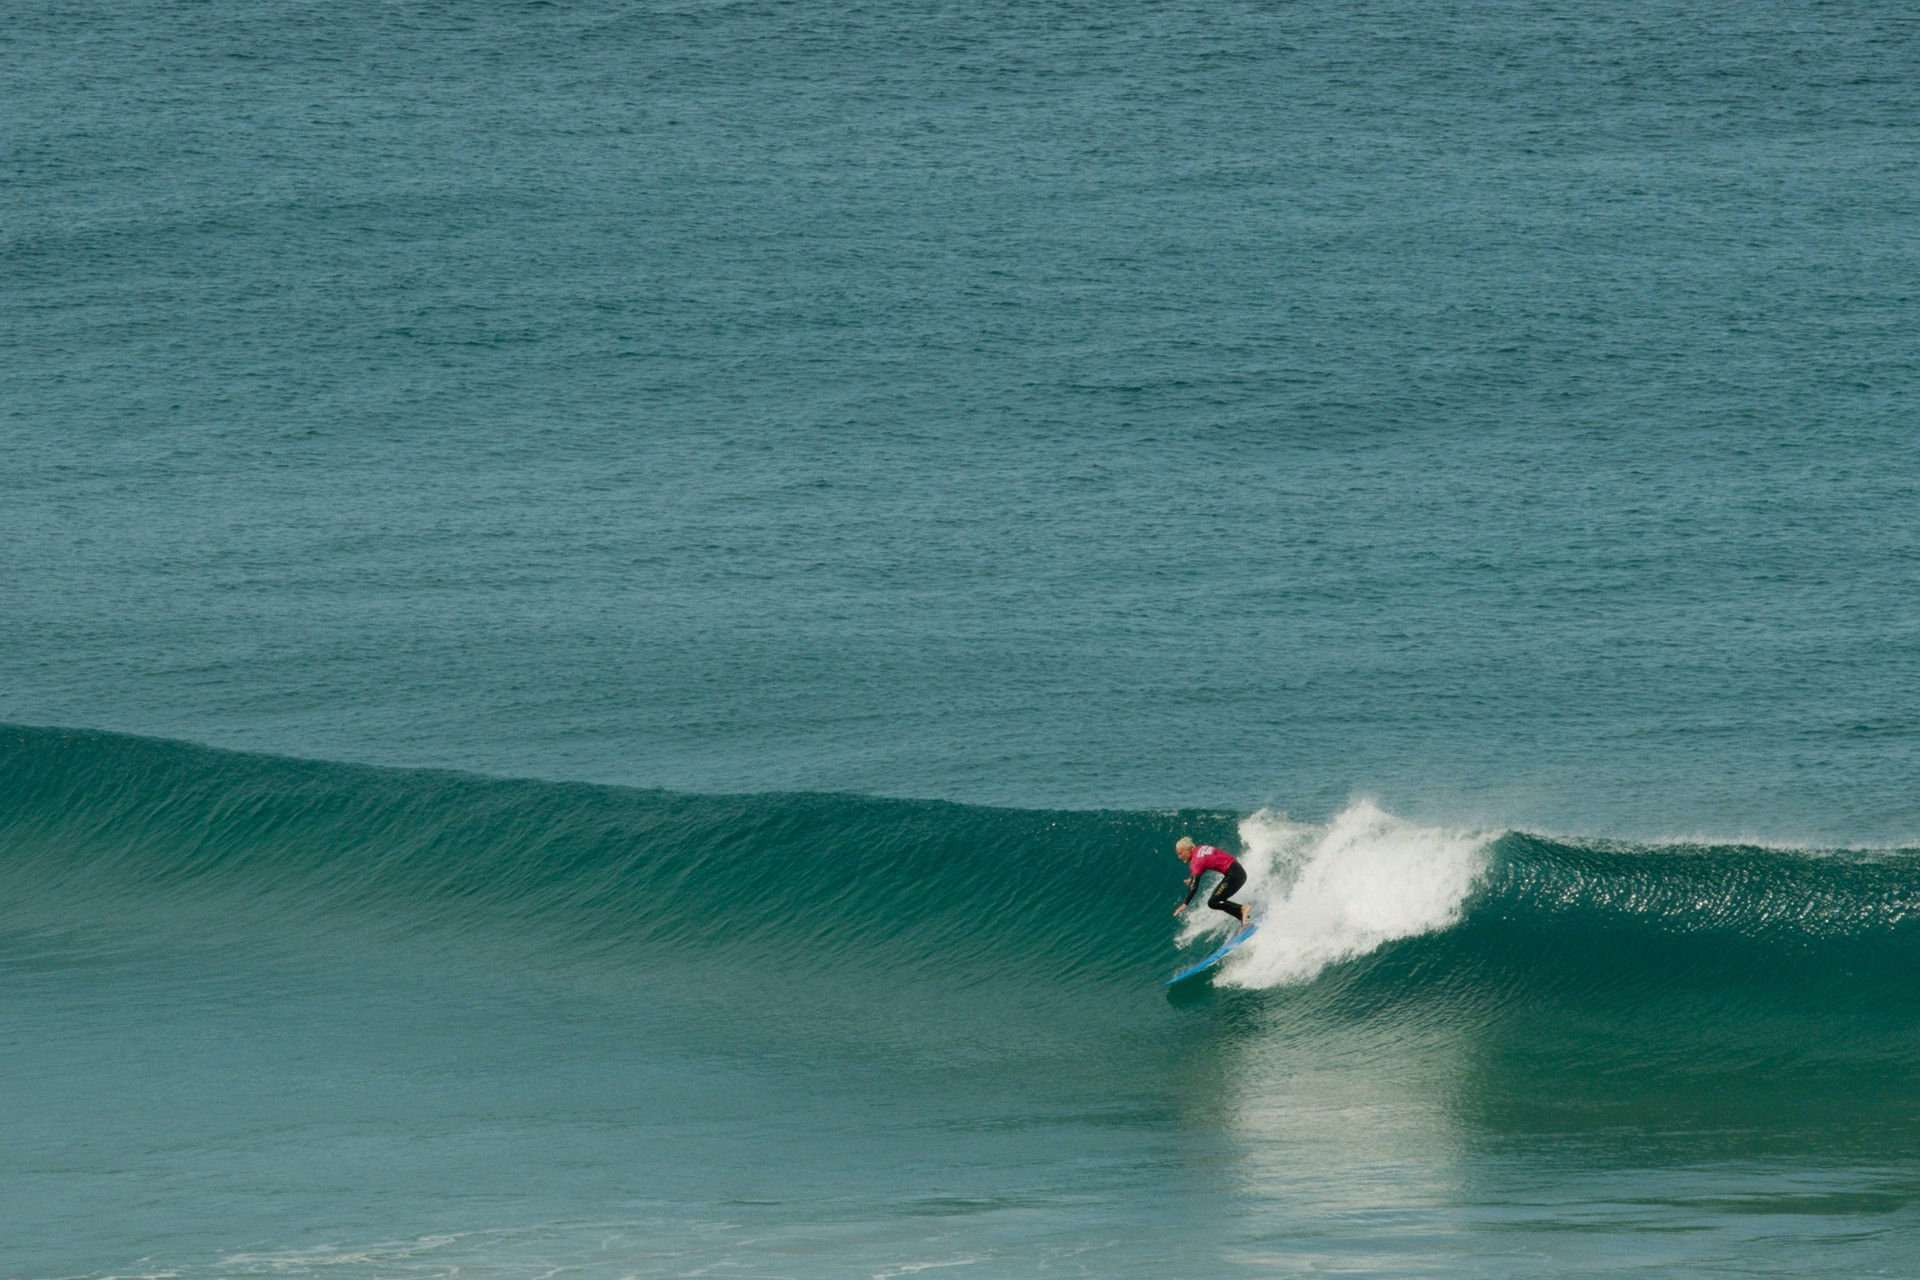 A surfer in action at La Pared, Fuerteventura